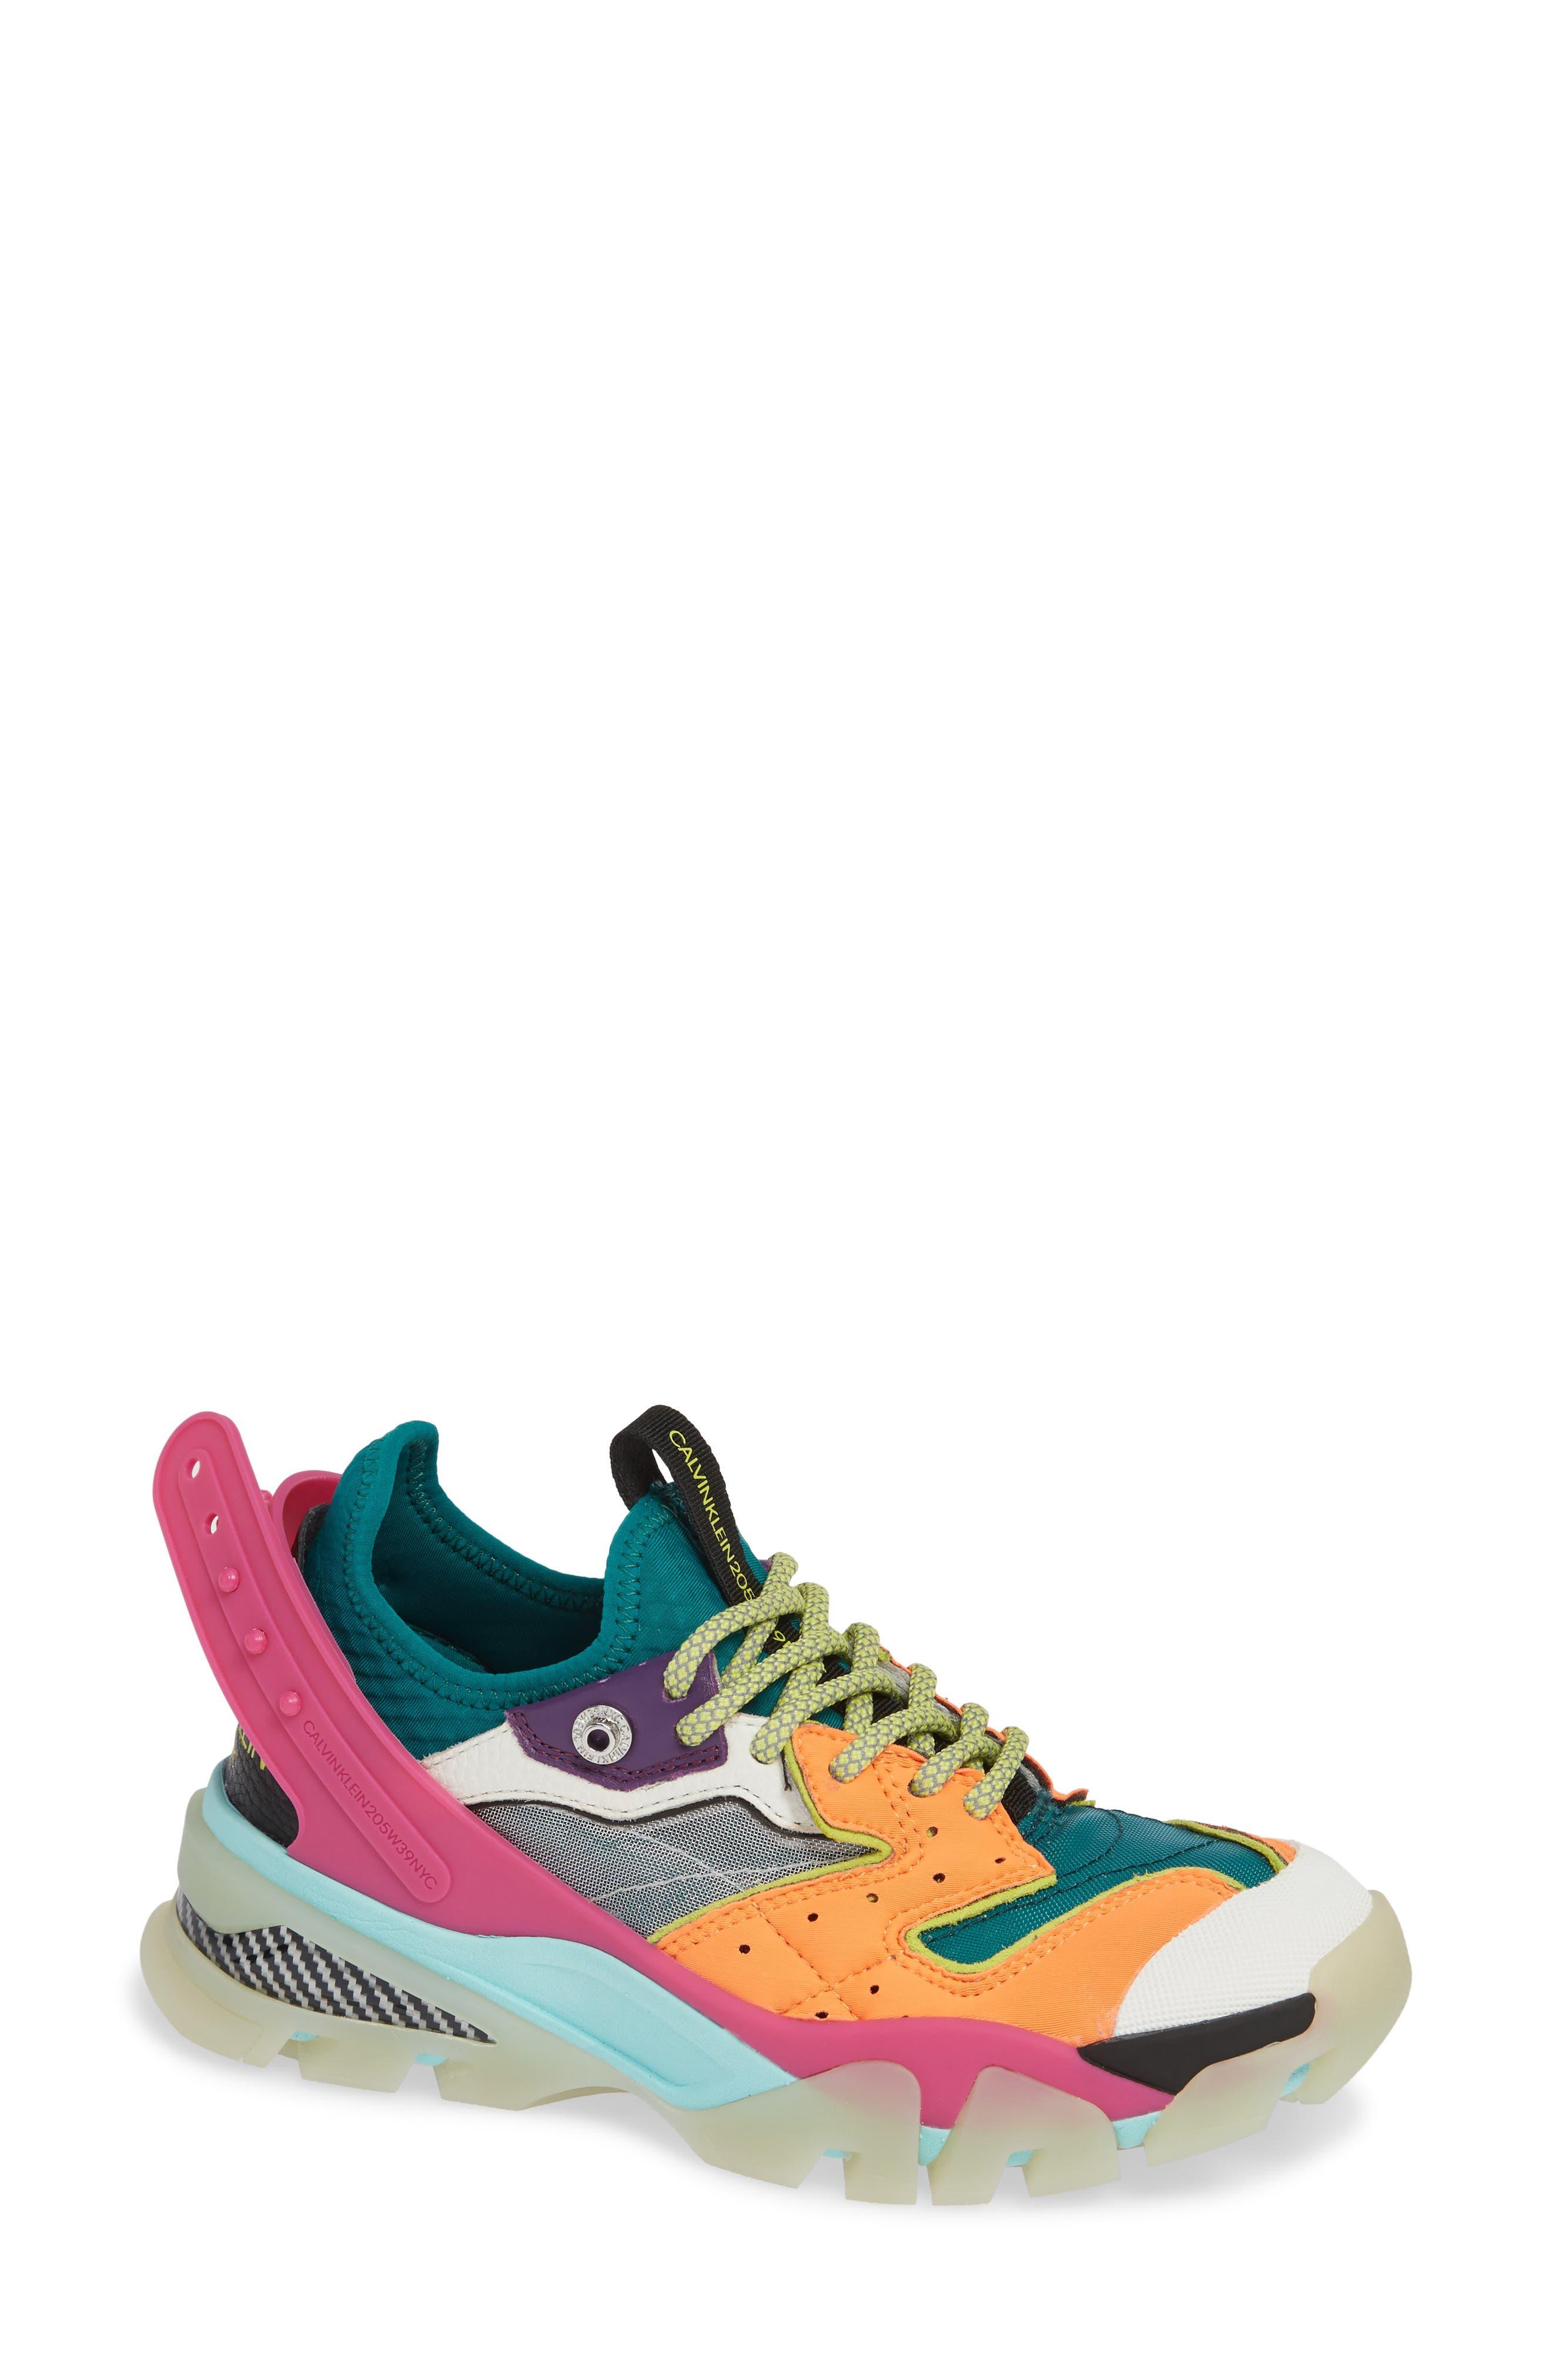 63eec3916e89 Women s White Designer Shoes